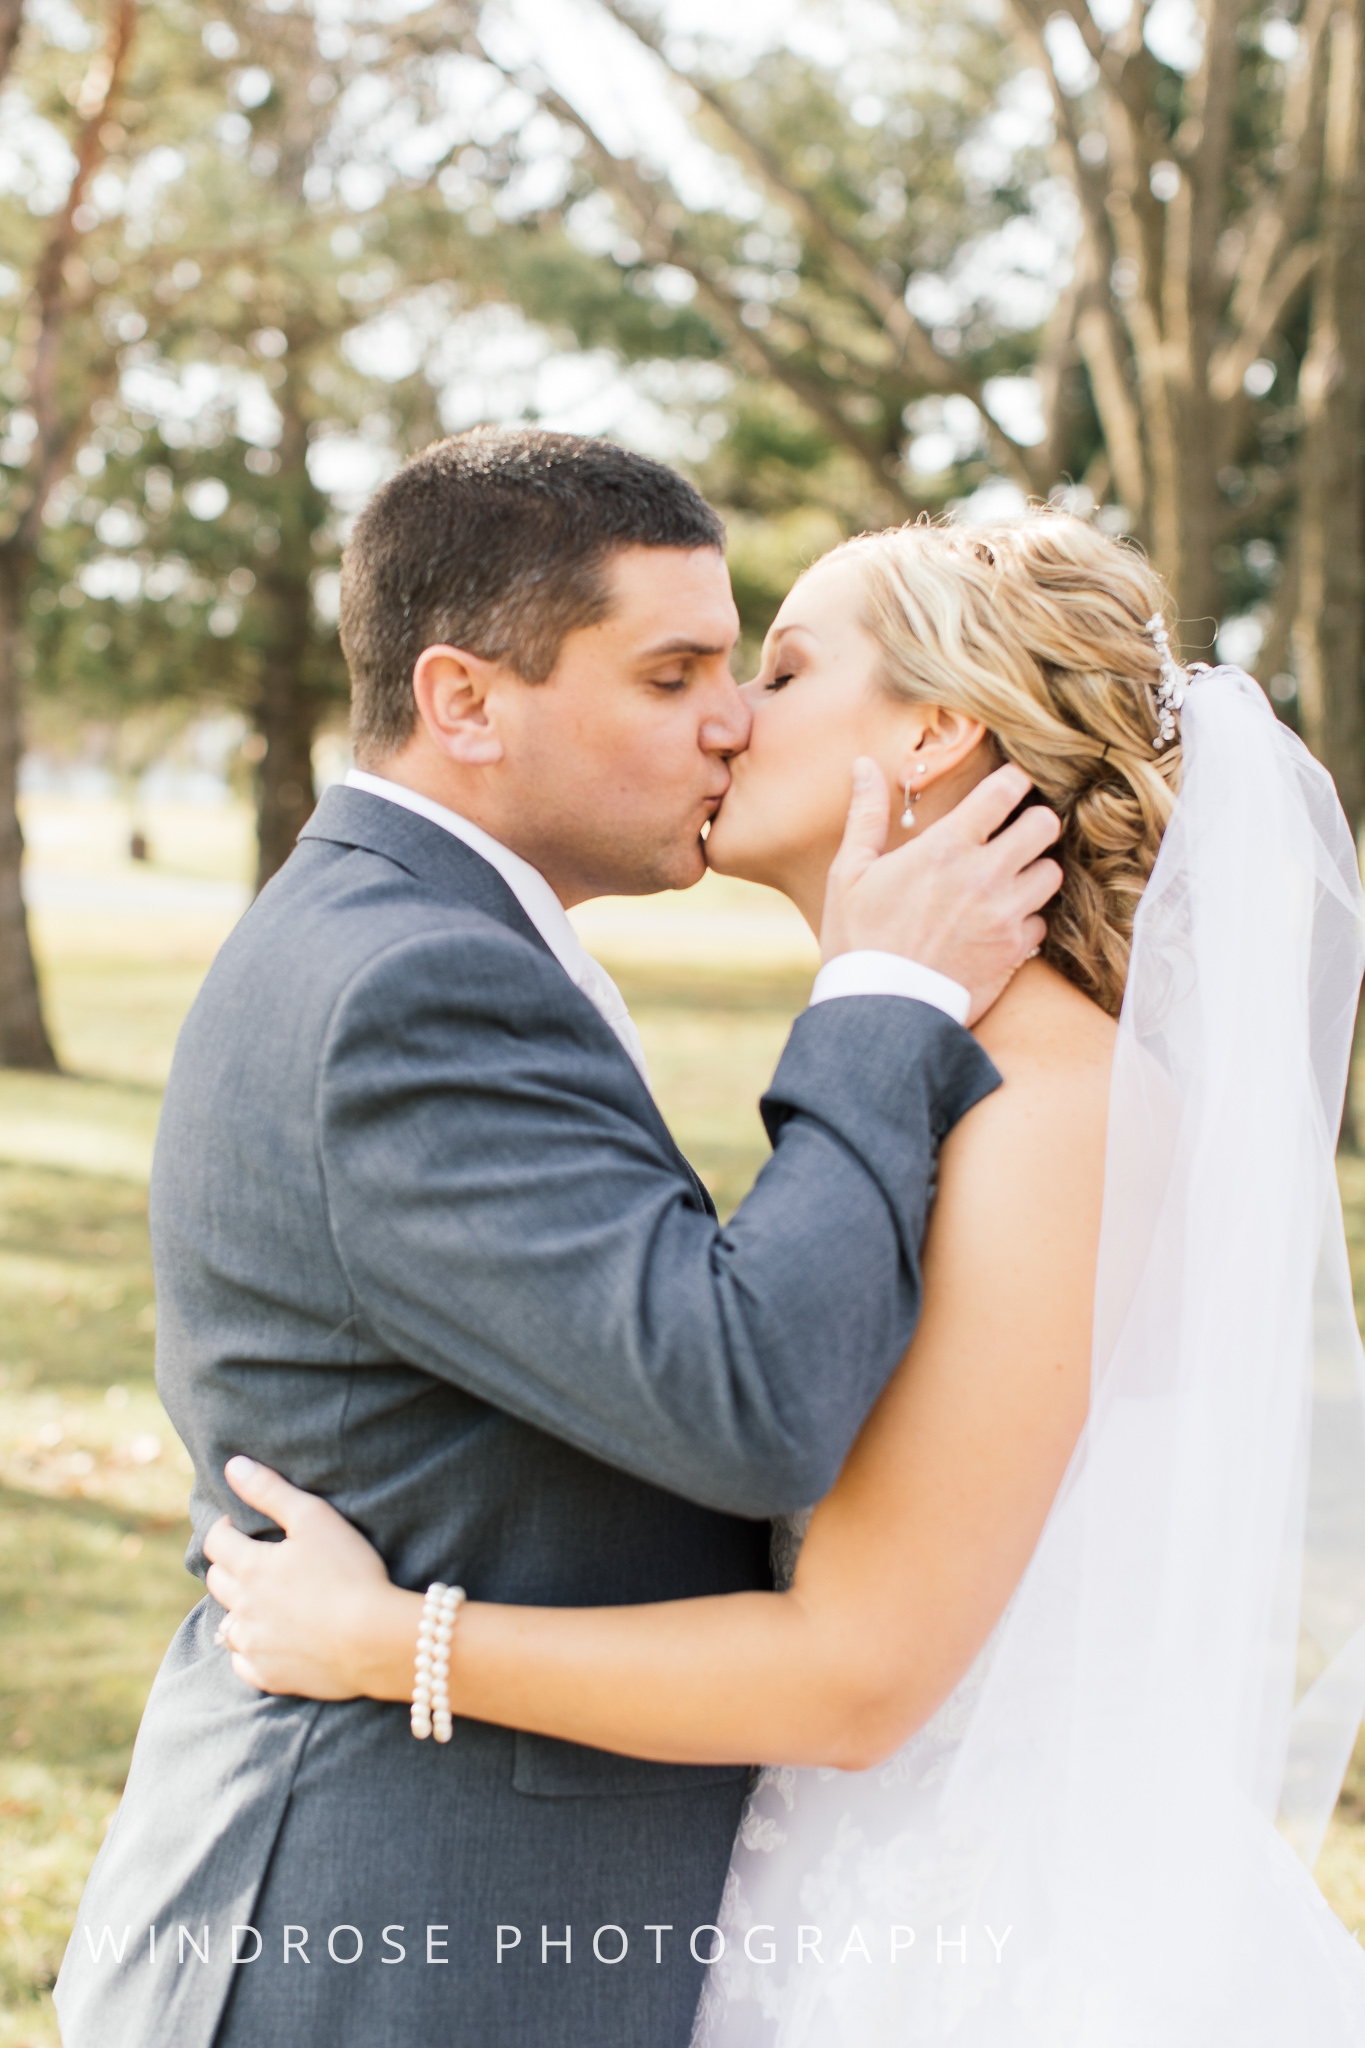 Rochester-MN-Wedding-Photo-13.jpg